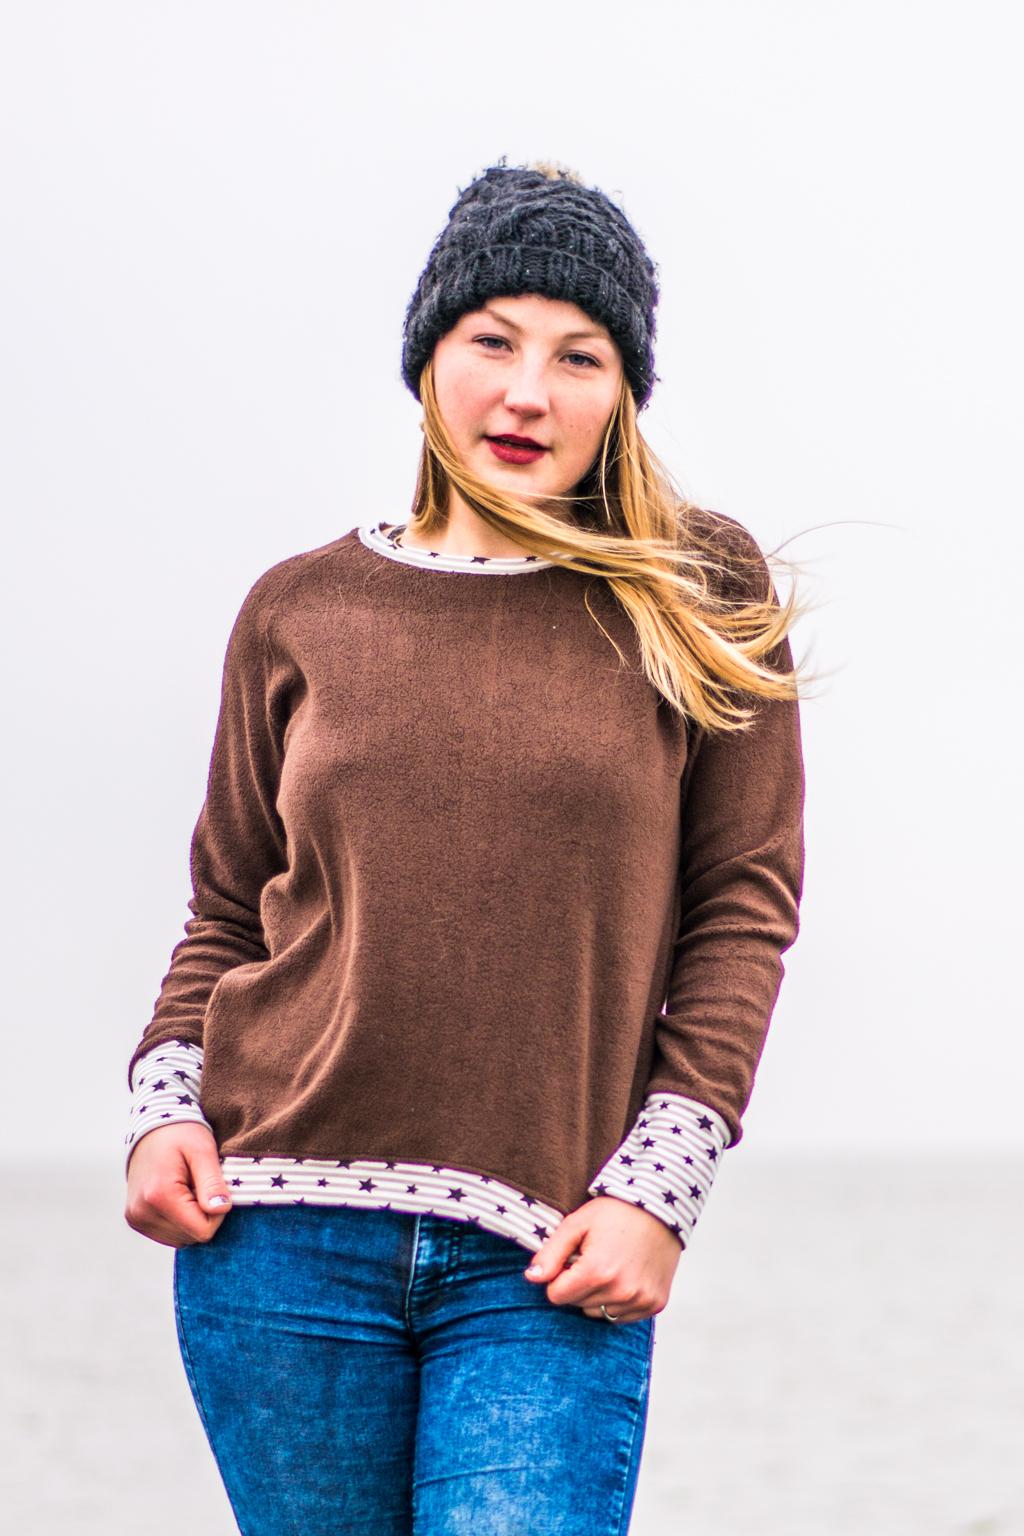 Kuschelsweat Baumwollfleece #Feenstaub-Mode